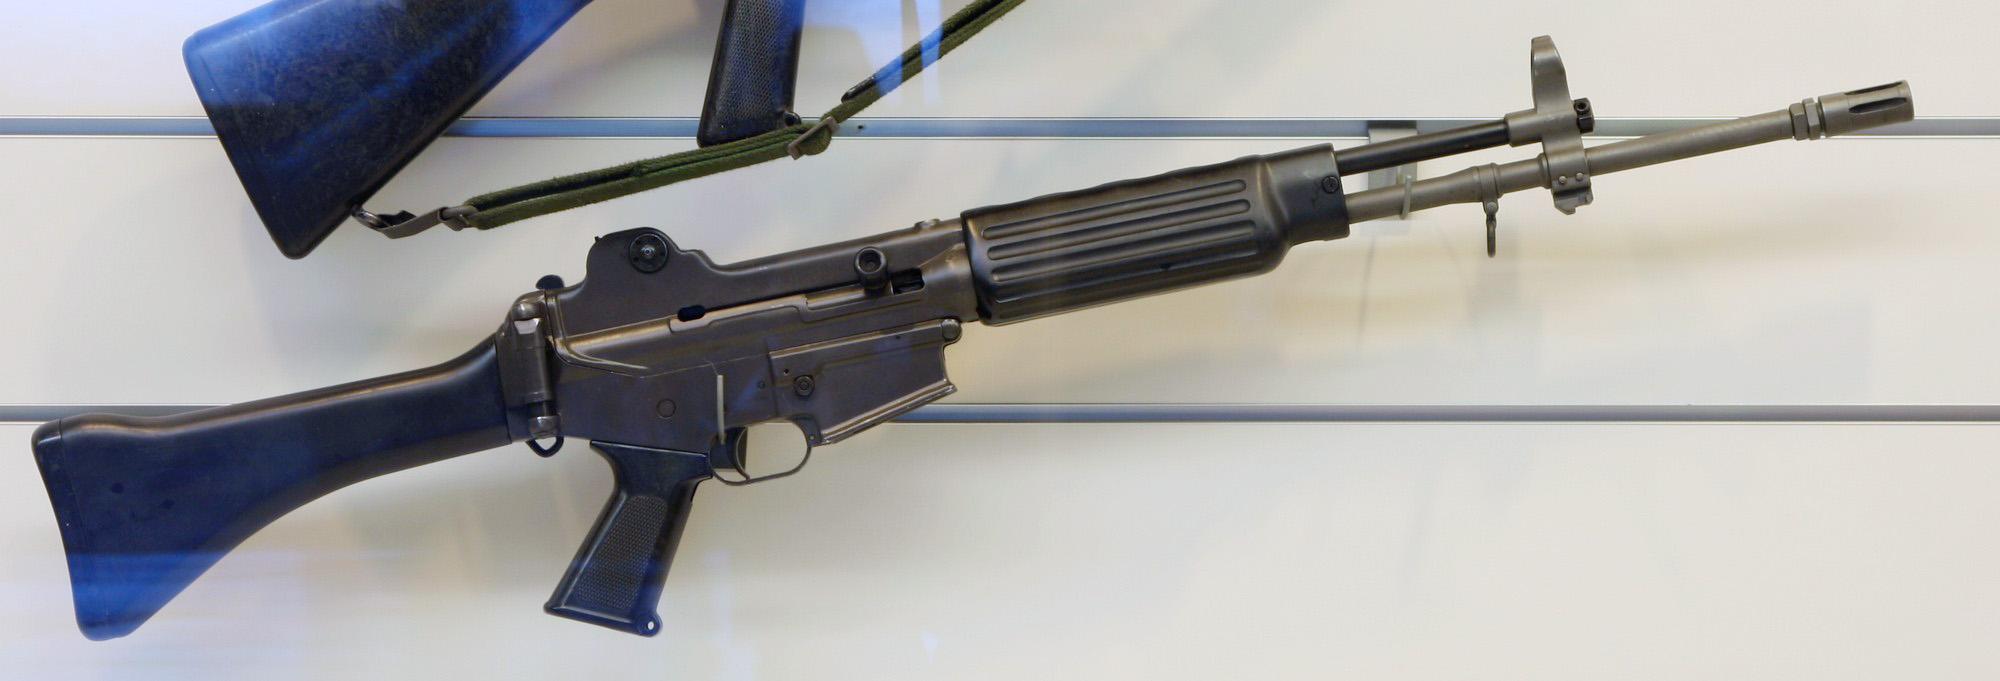 south korean daewoo k2 rifle in nigeria armament research services rh armamentresearch com Moe K2 Grip AR-15 M4 Gry Daewoo Rifle Review